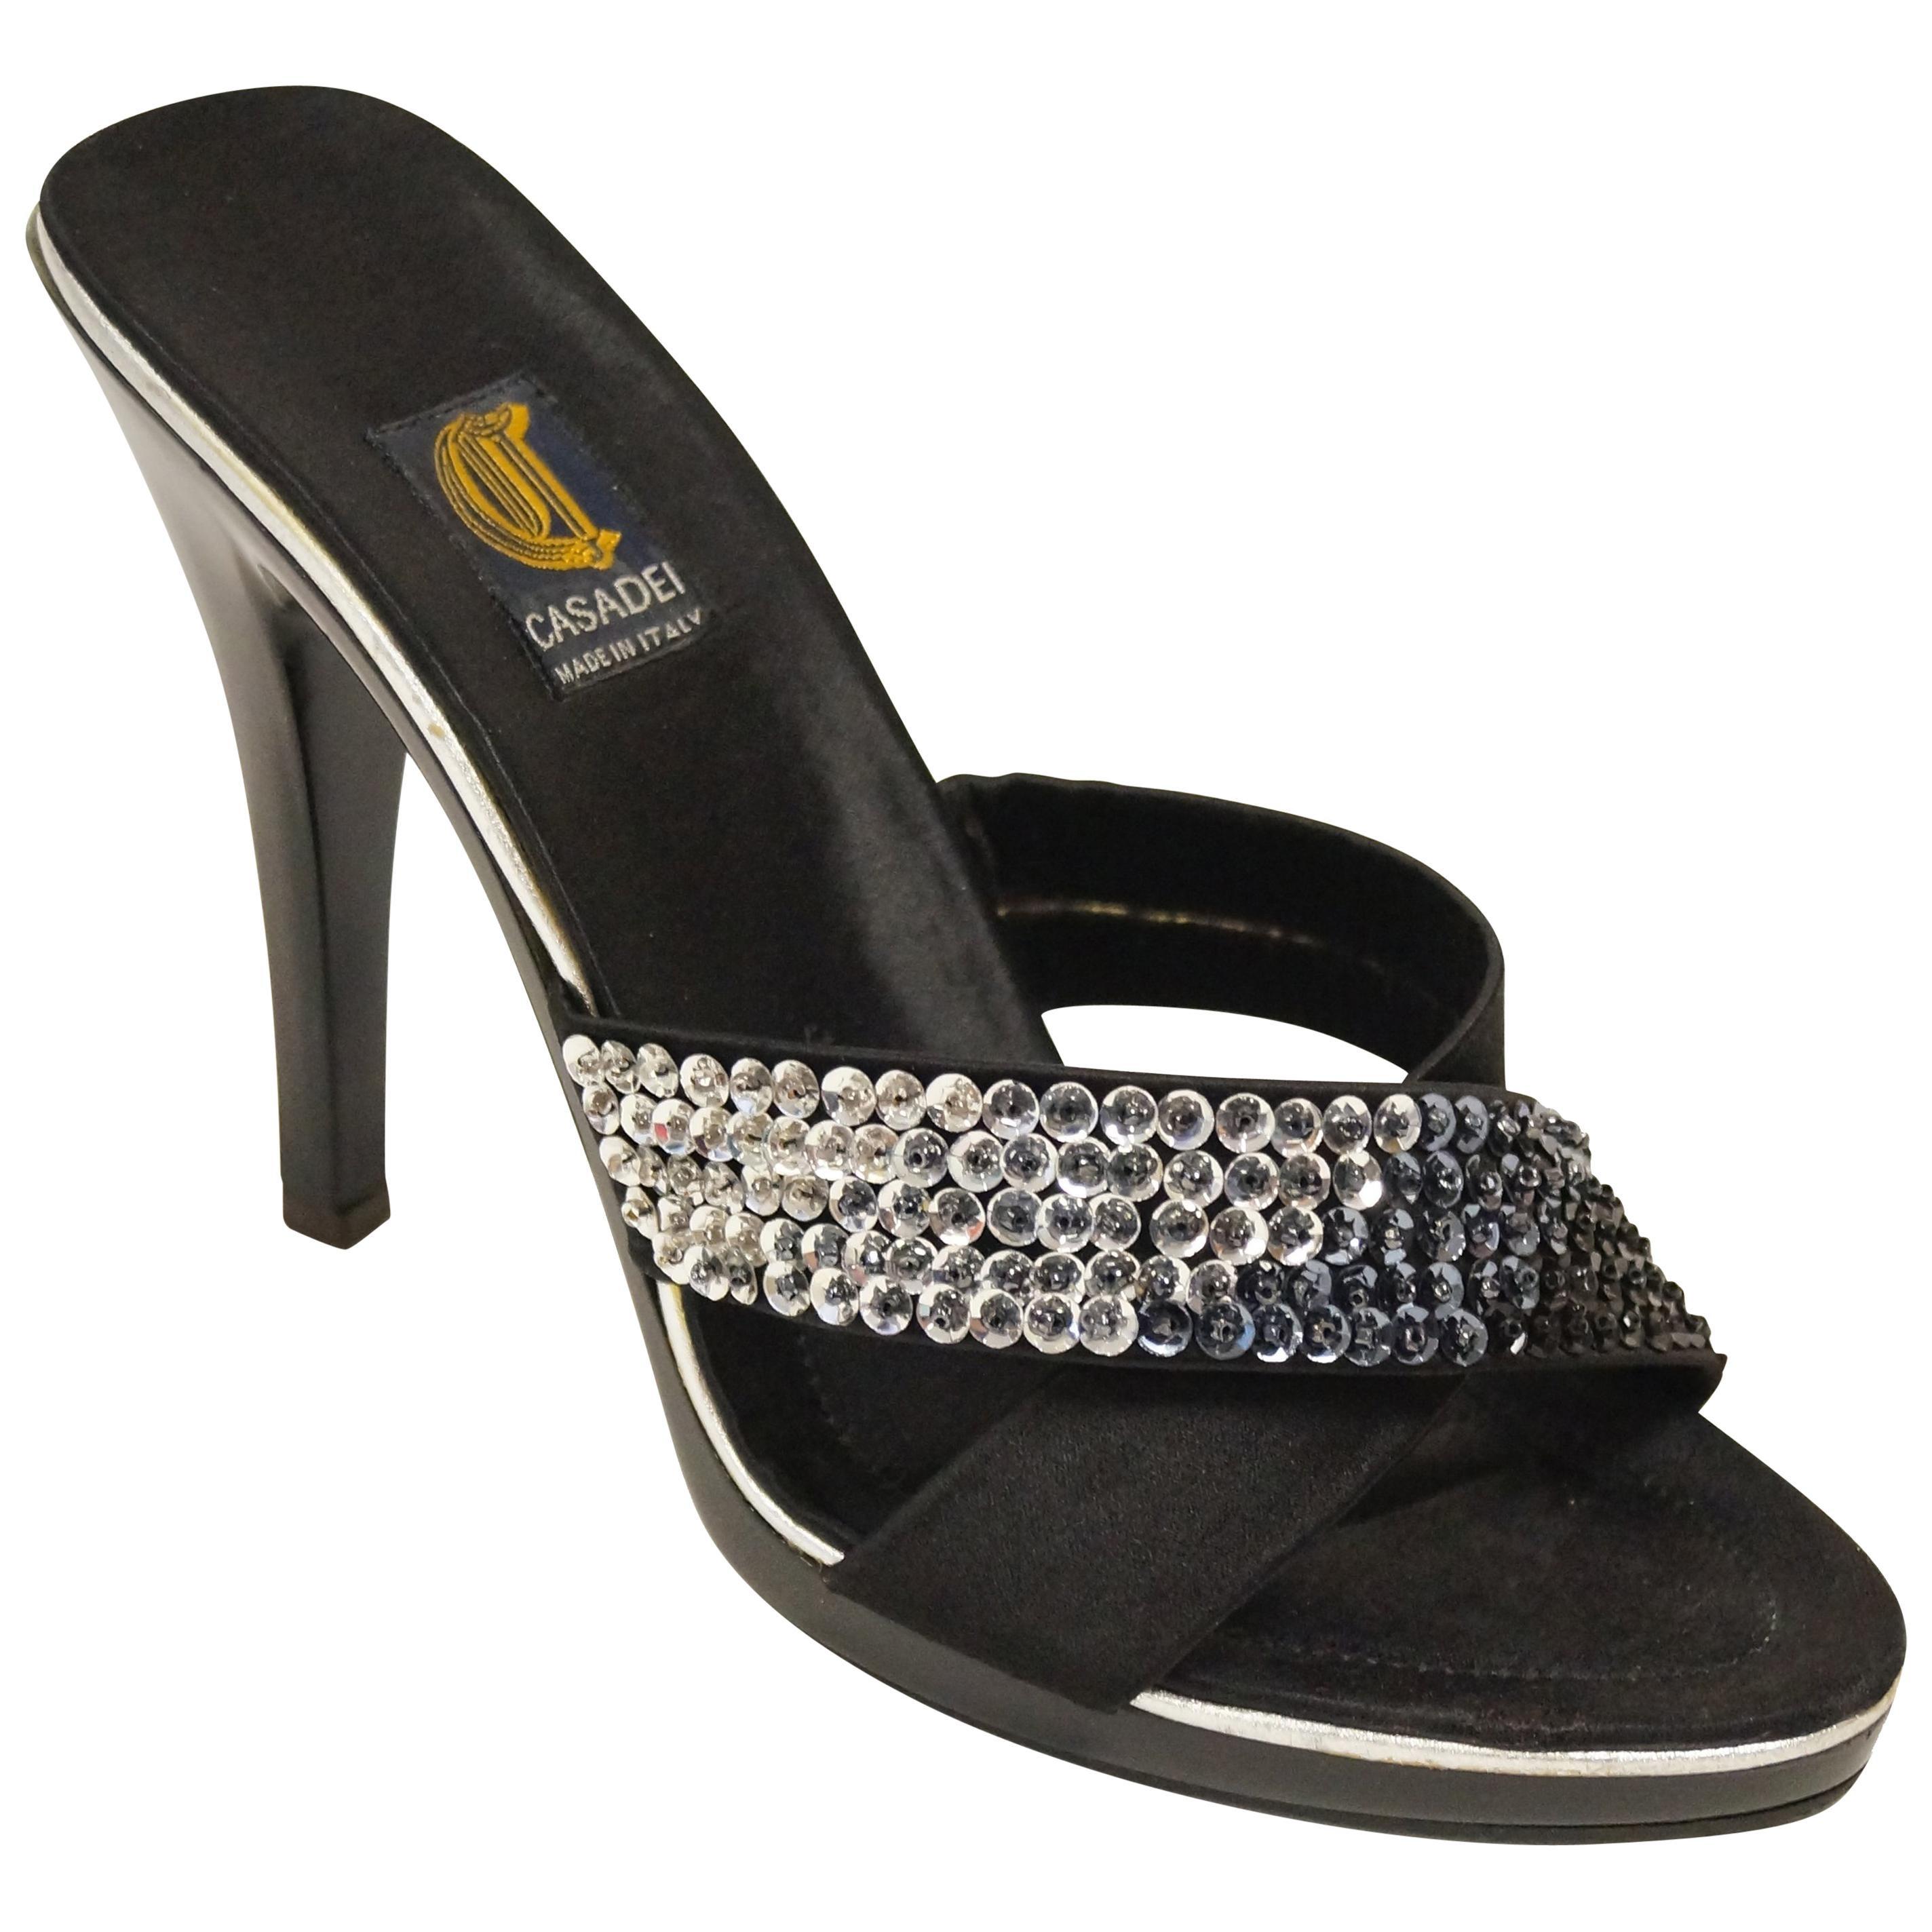 Casadei Black Satin and Sequin Strappy Sandals